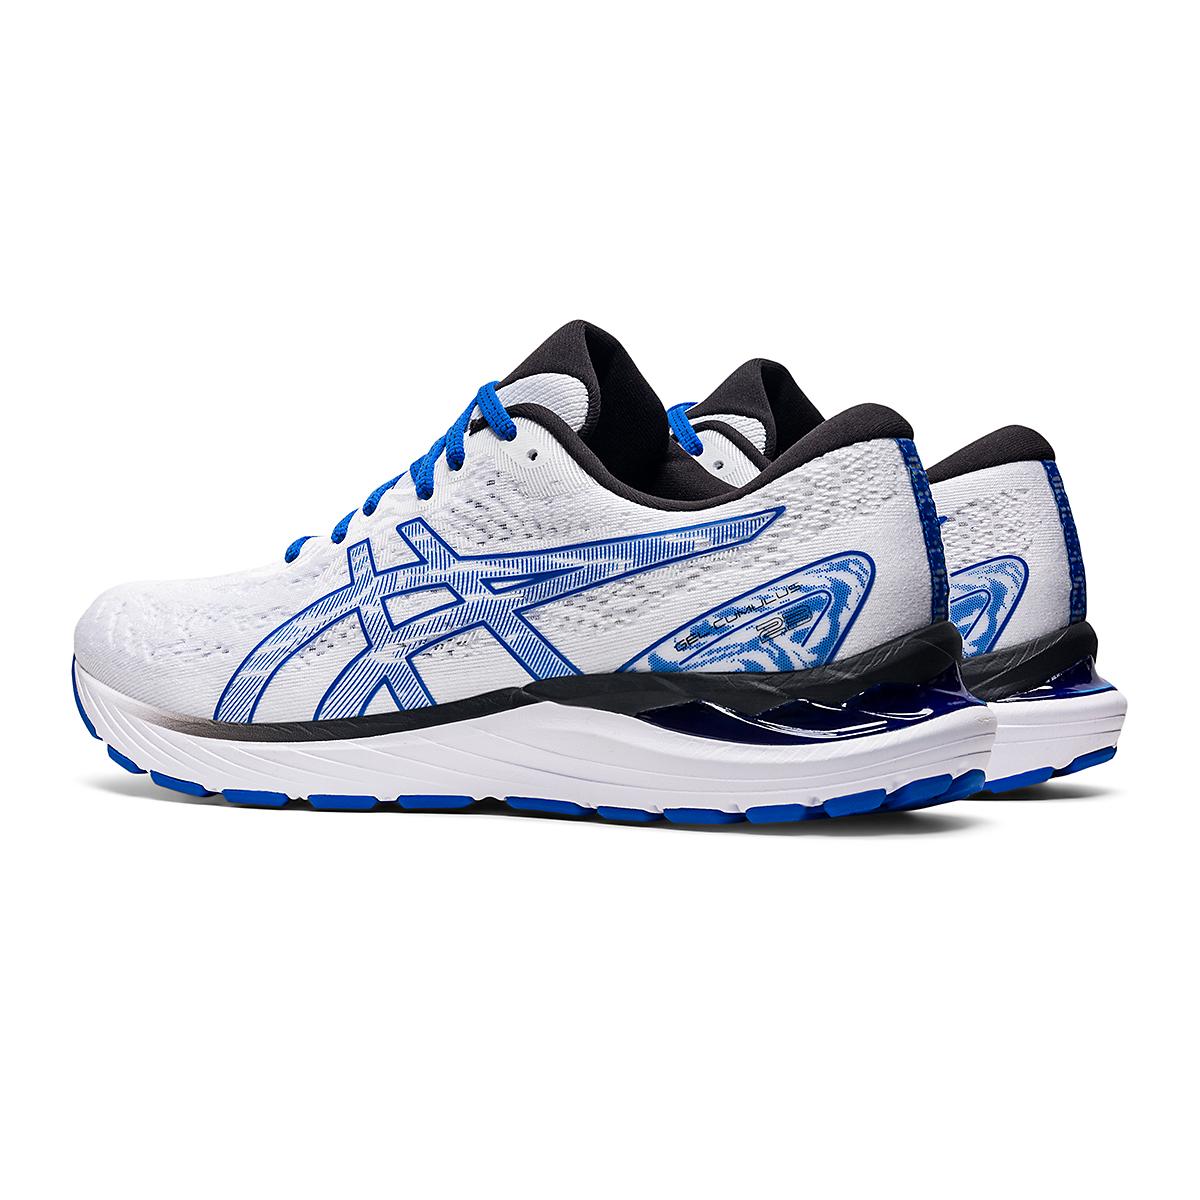 Men's Asics SMU Gel-Cumulus 23 Running Shoe - Color: White/Tuna Blue - Size: 6 - Width: Regular, White/Tuna Blue, large, image 4